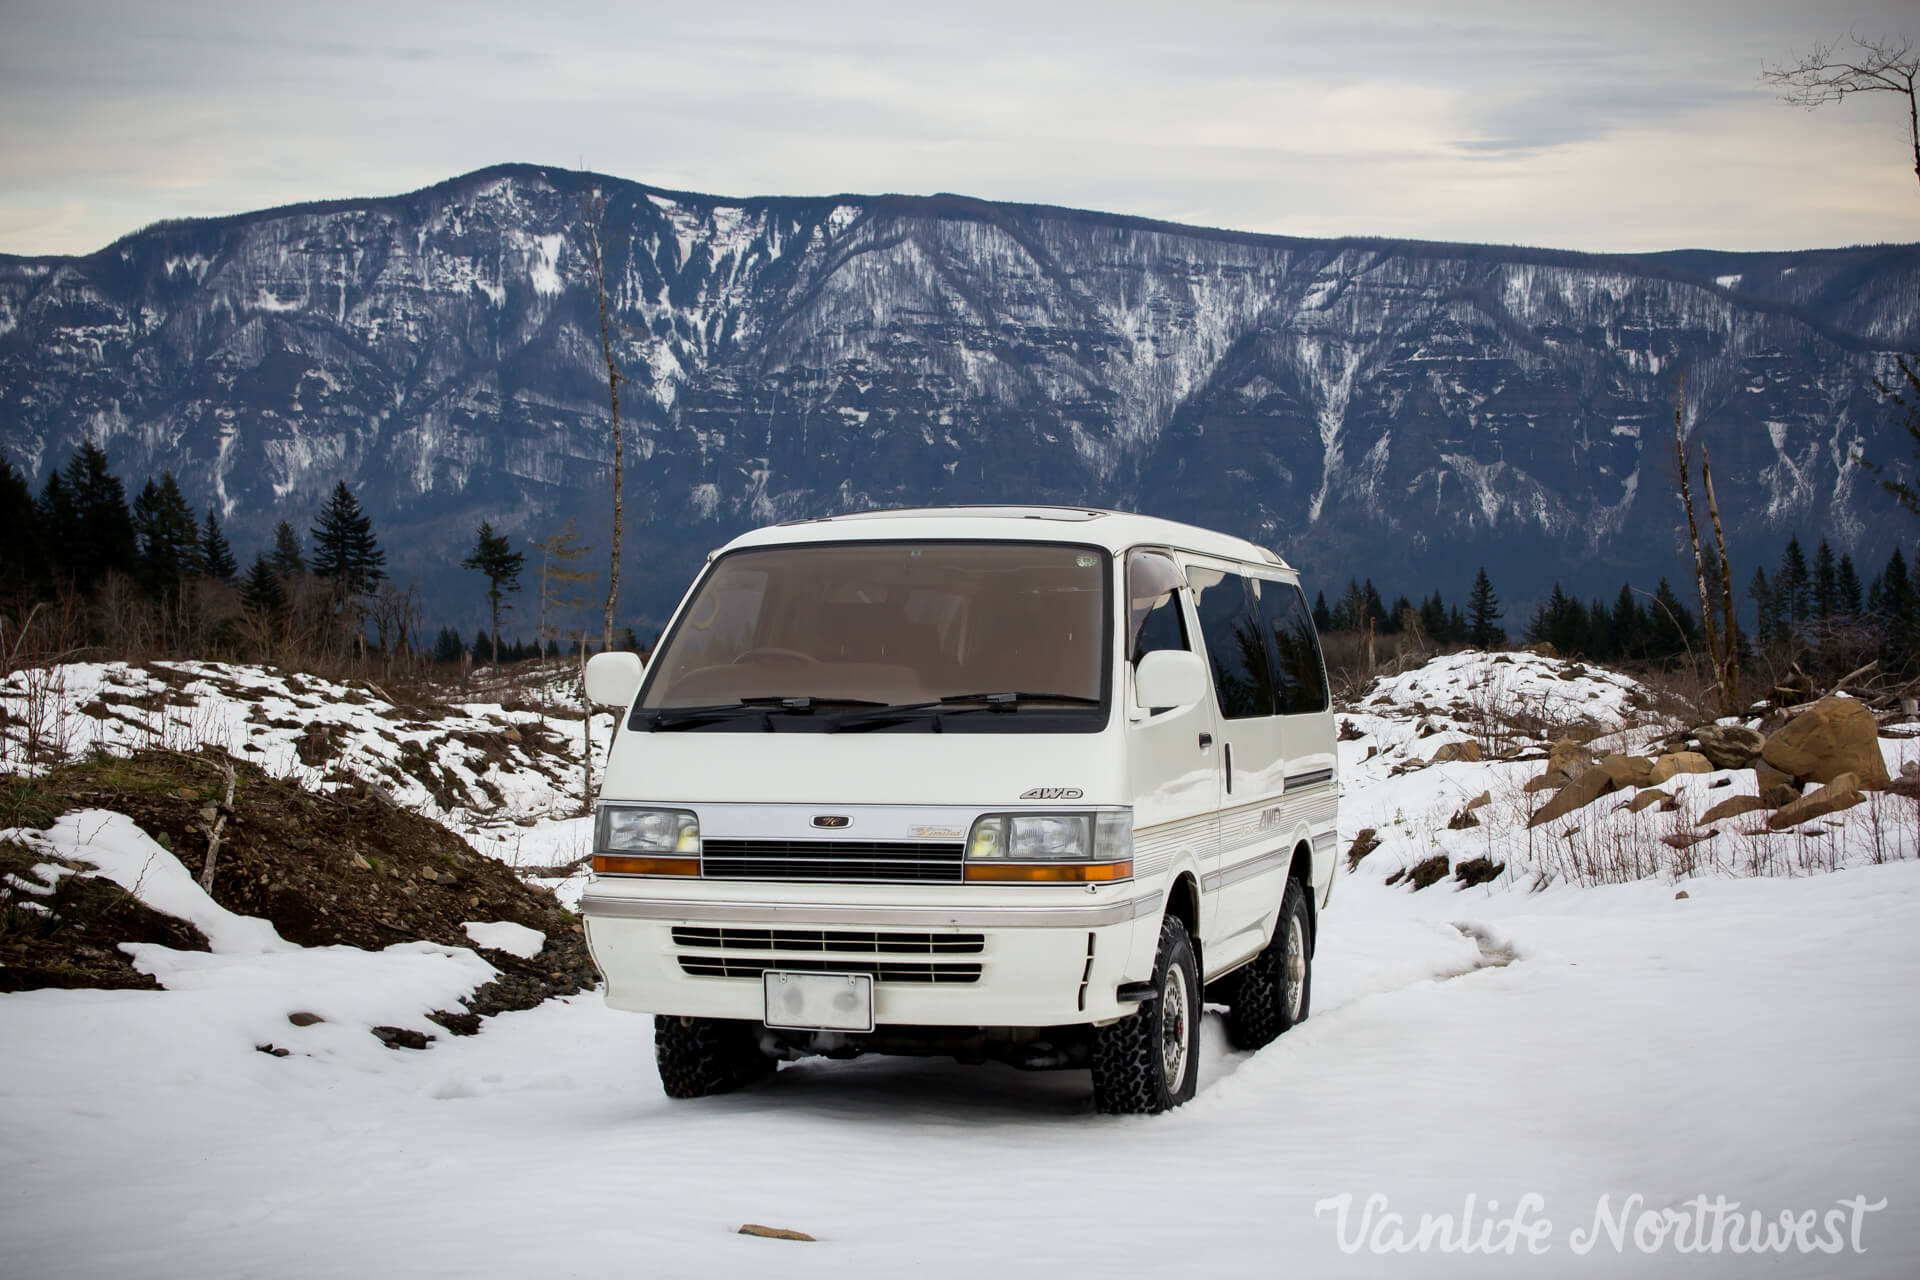 1992 TOYOTA HIACE SUPER CUSTOM LIMITED 4WD — Vanlife Northwest